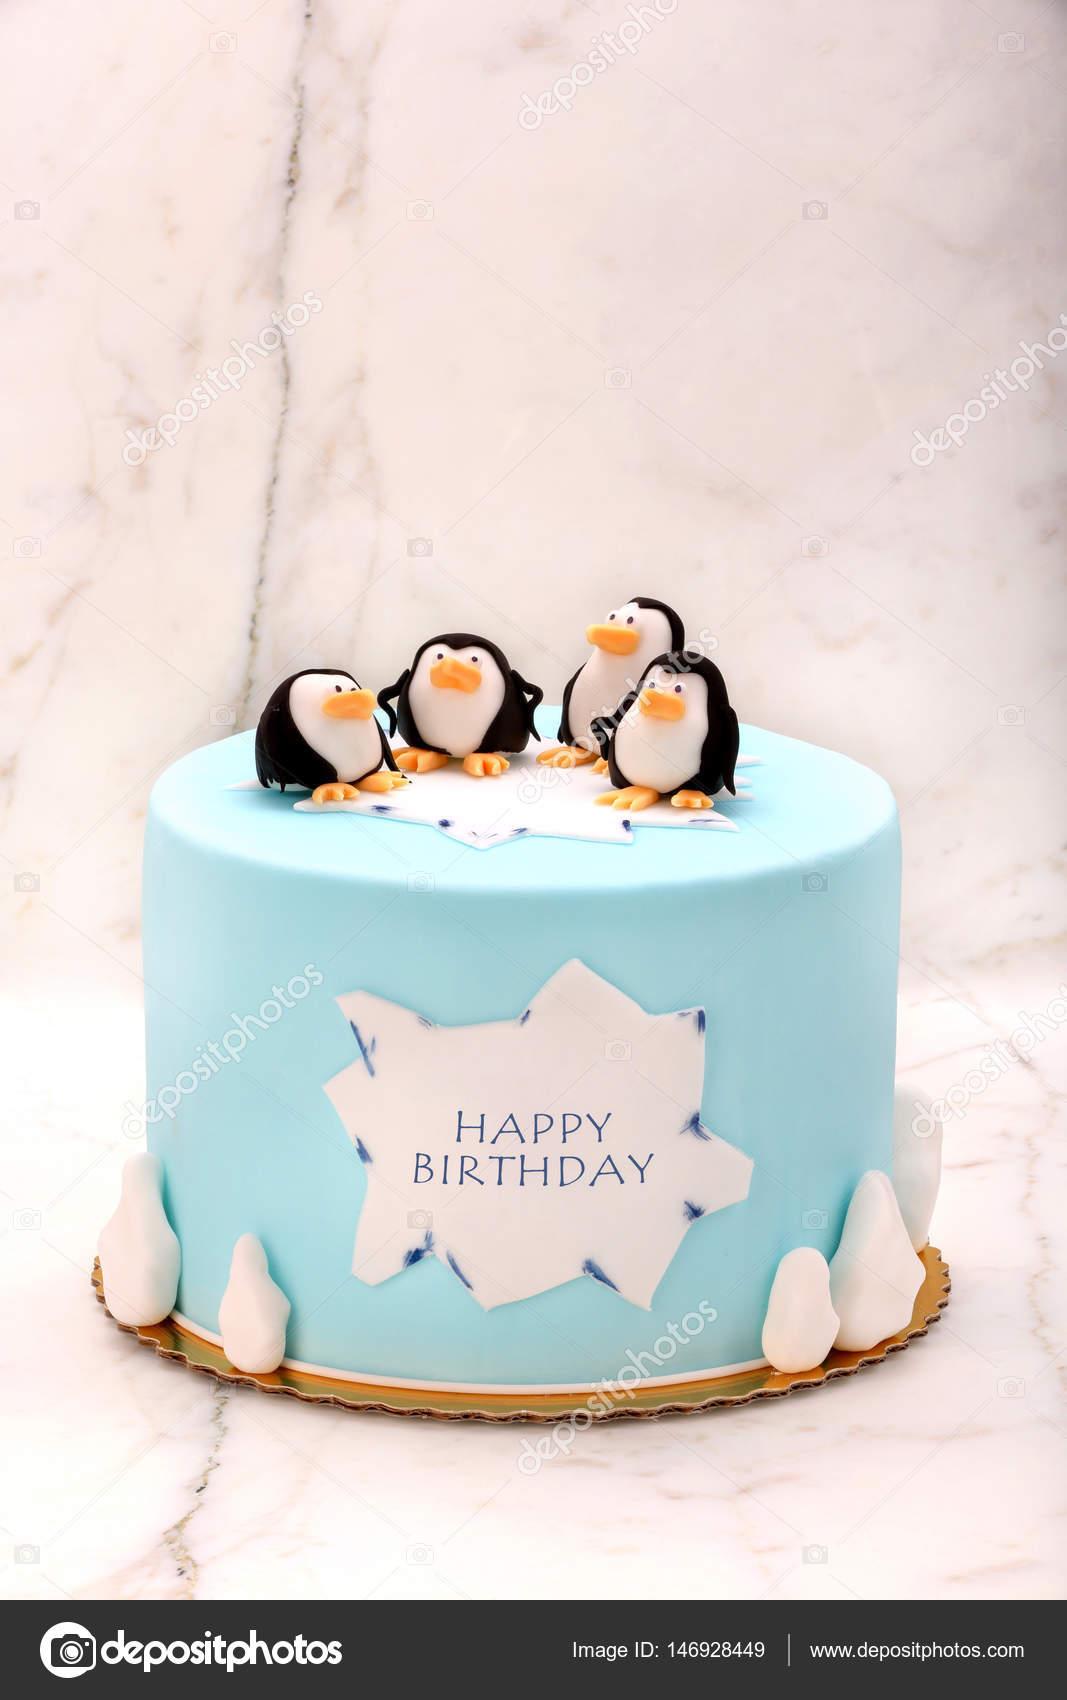 Amazing Pictures Penguins Birthday Cake Birthday Cake With Penguins On Funny Birthday Cards Online Aeocydamsfinfo